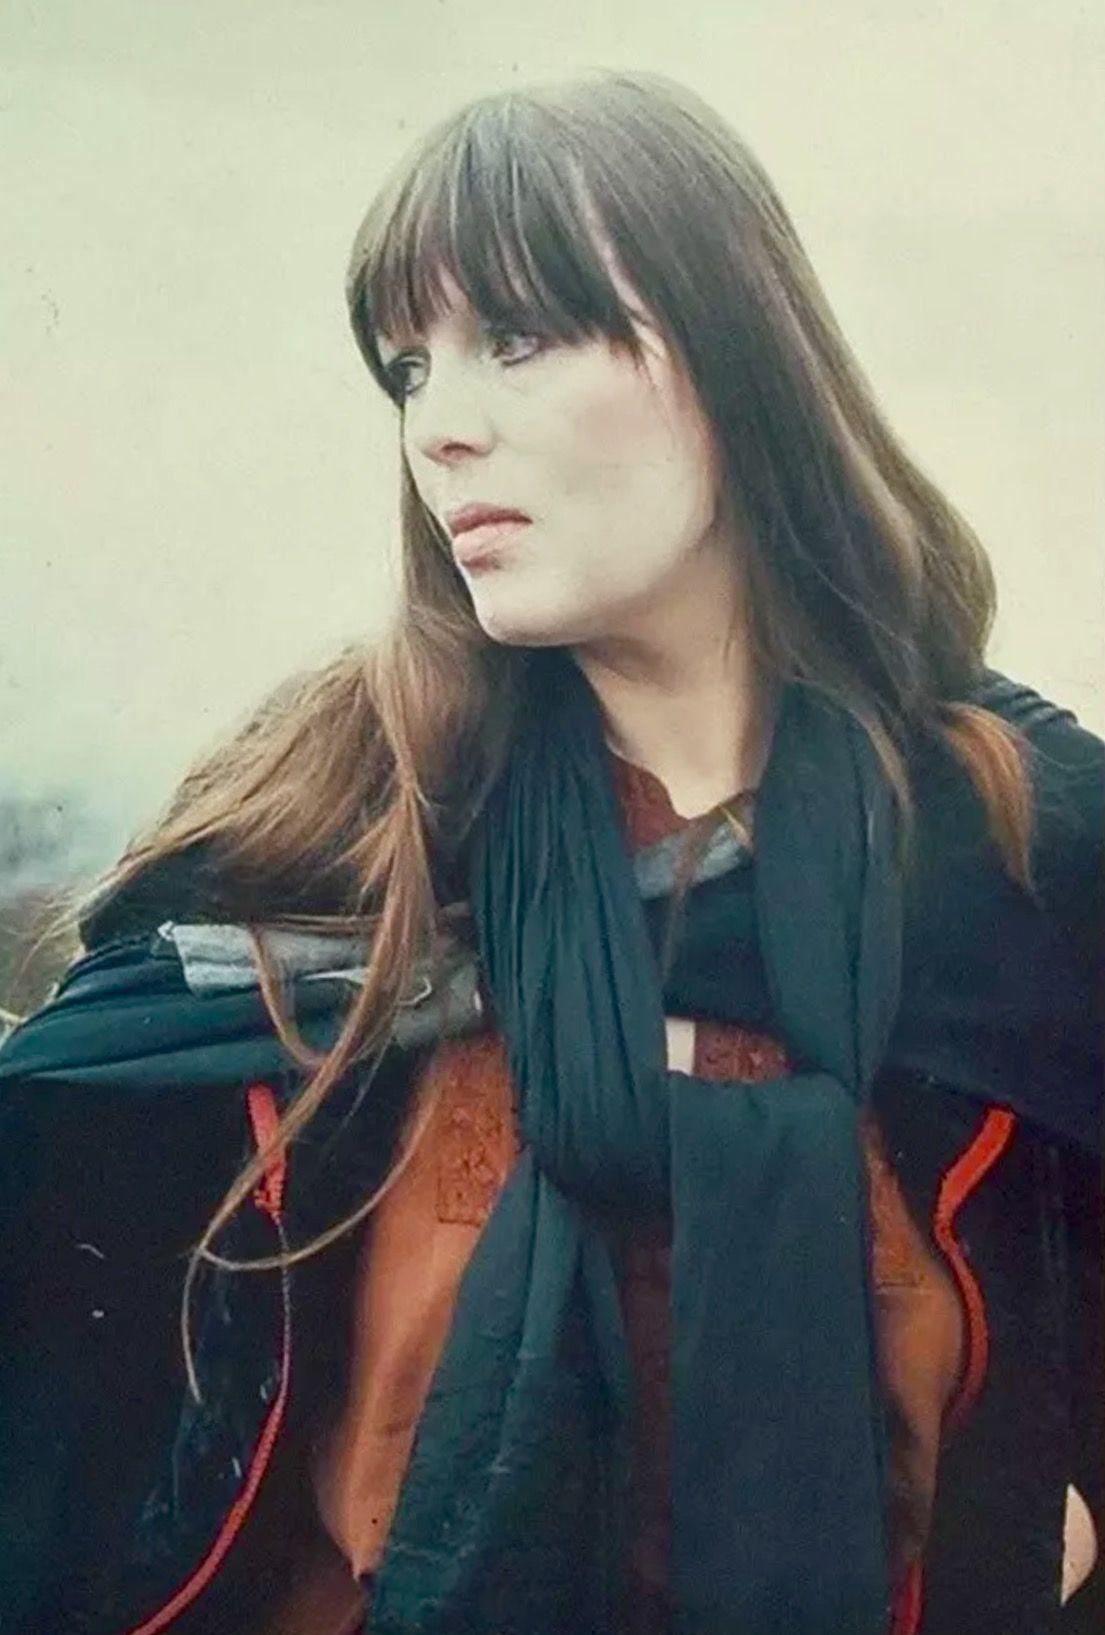 Nico circa 1970 #ChristaPäffgen #TheVelvetUnderground https://t.co/tuDWIDxNTj